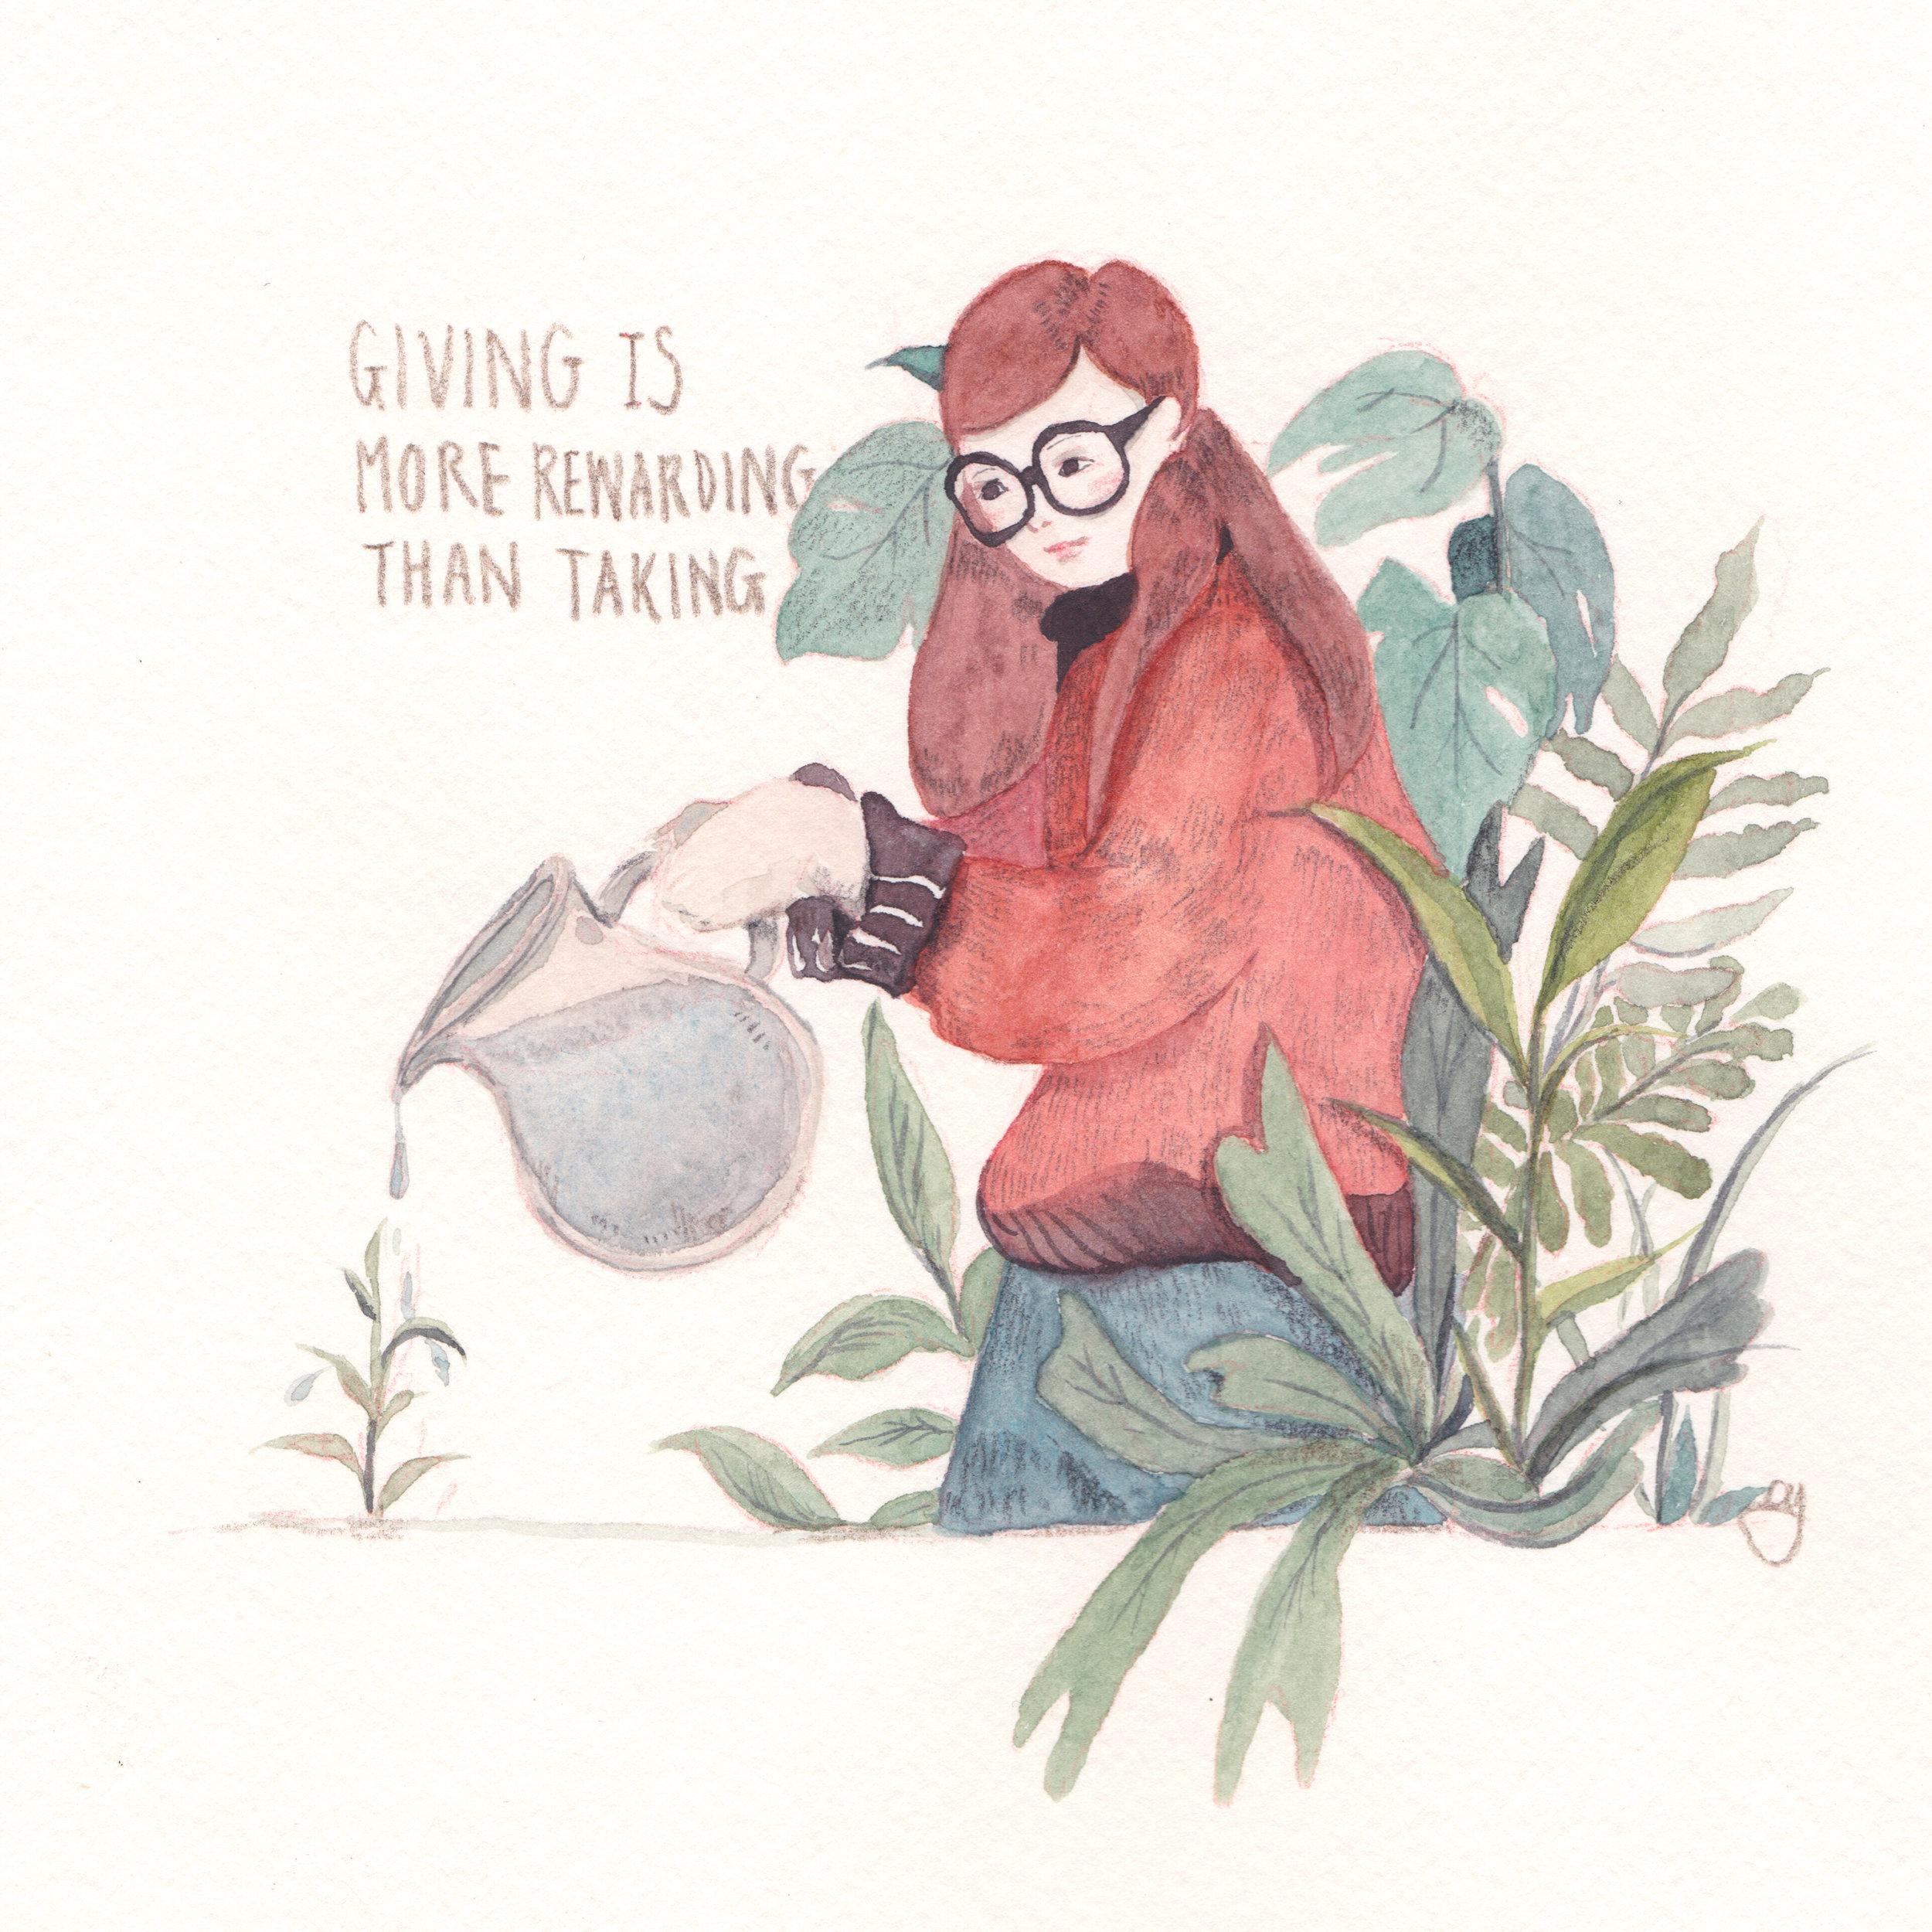 Giving is more rewarding than taking